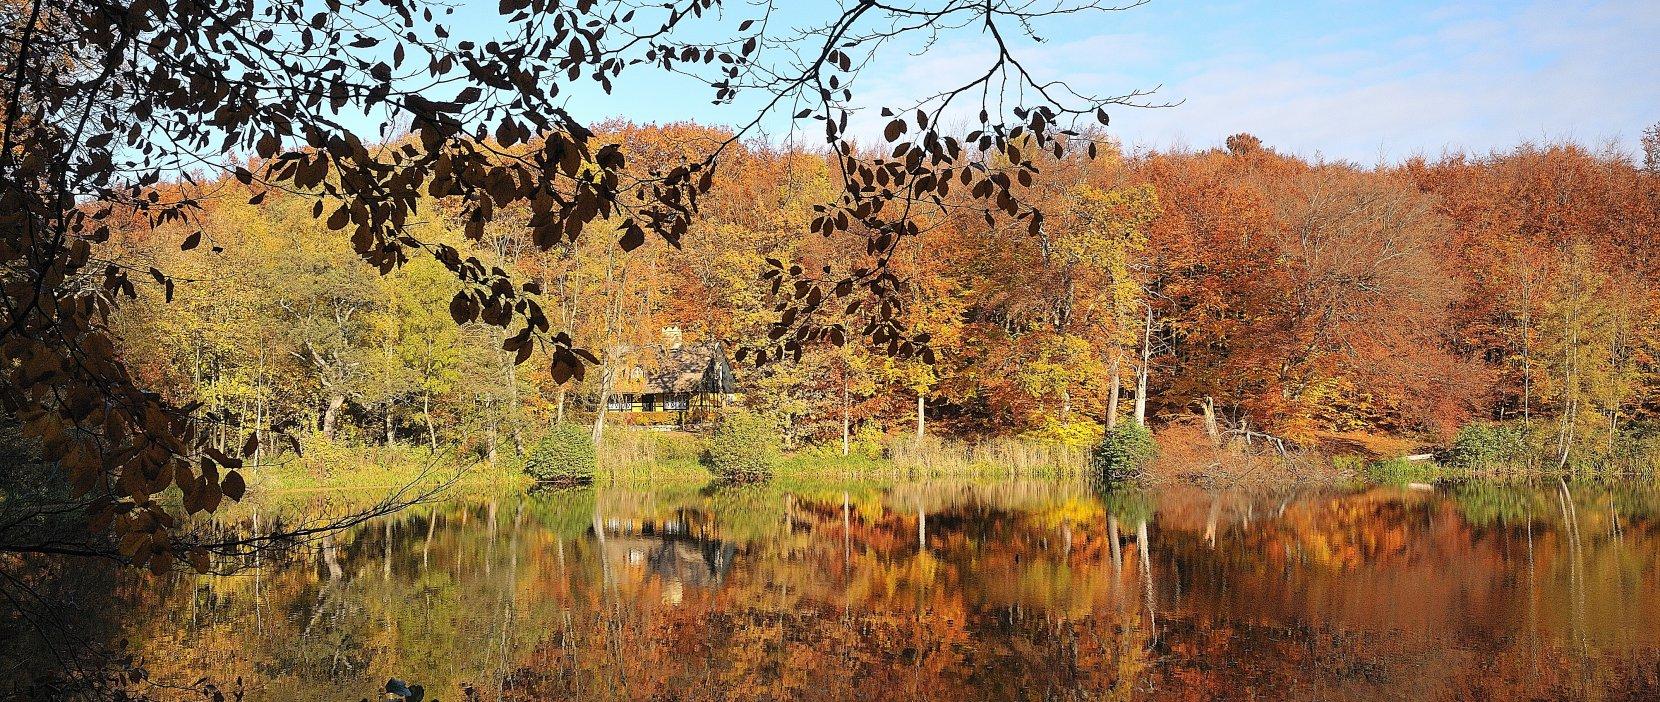 Enrum sø - Foto: Jess Kimmerslev